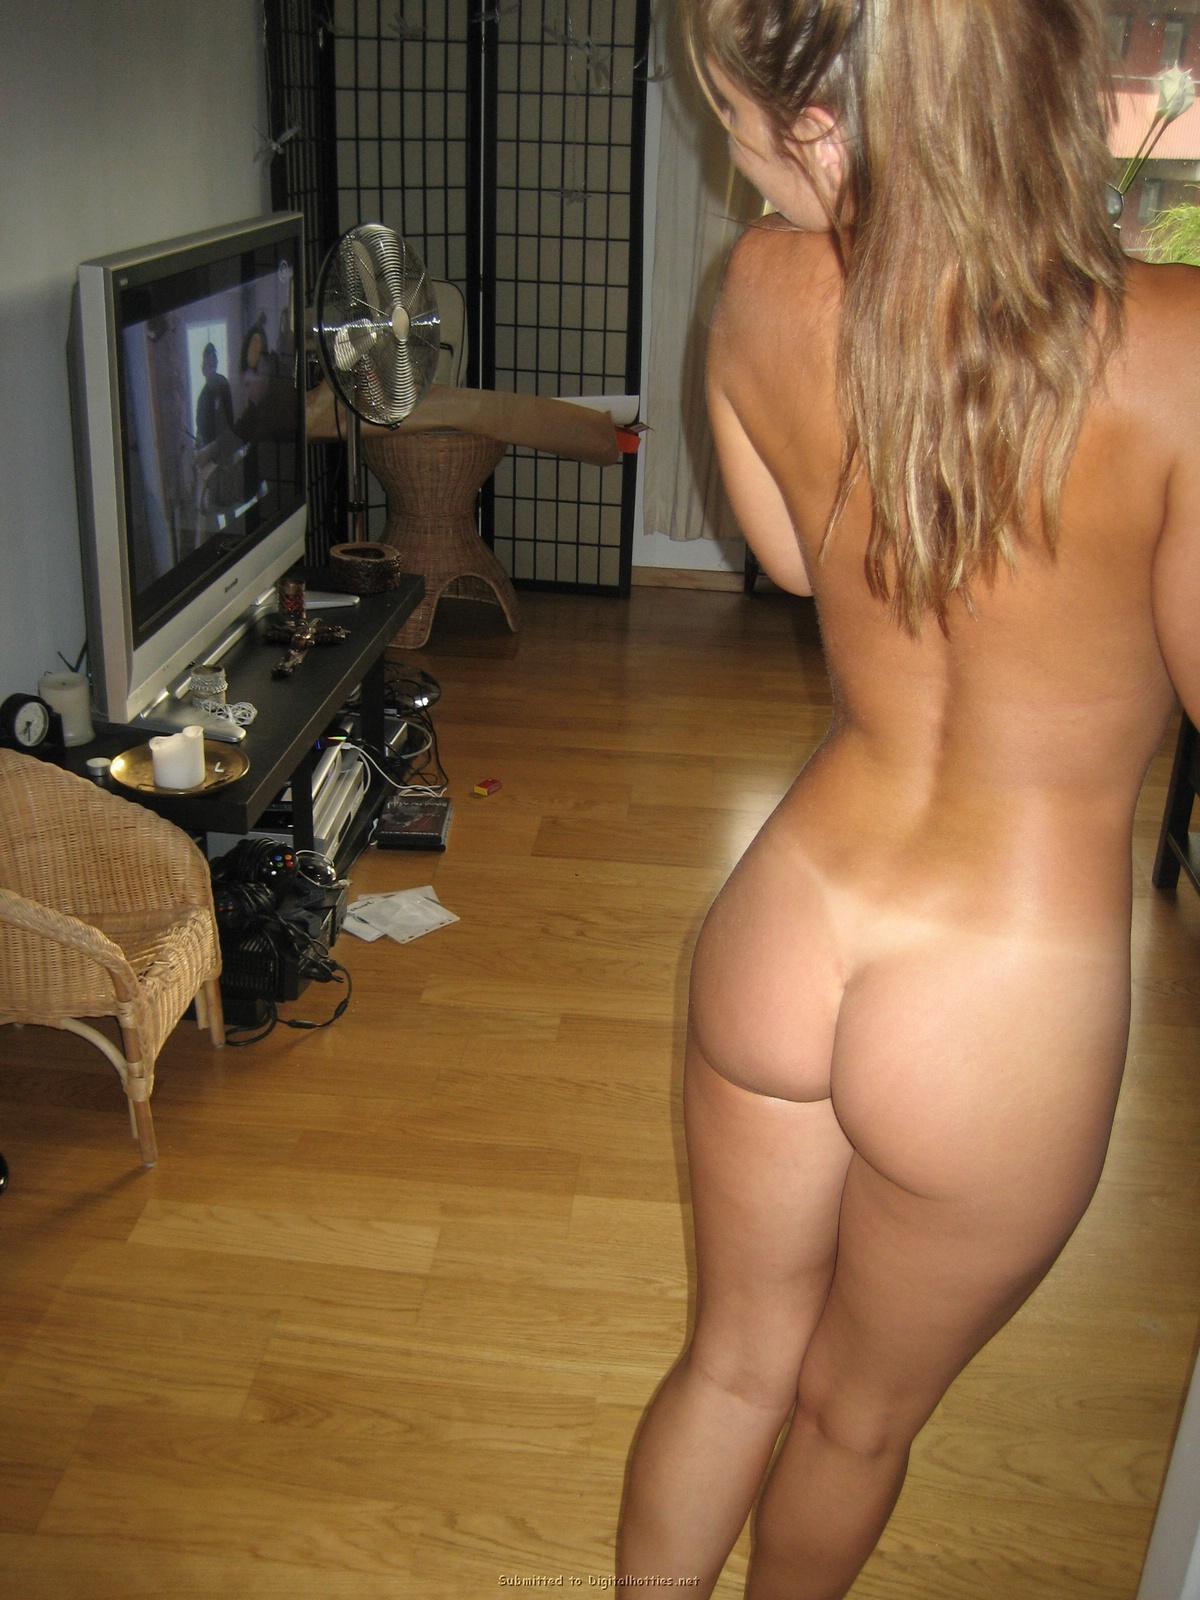 ex-girlfriend-nude-amateurs-girls-private-photo-mix-vol4-79